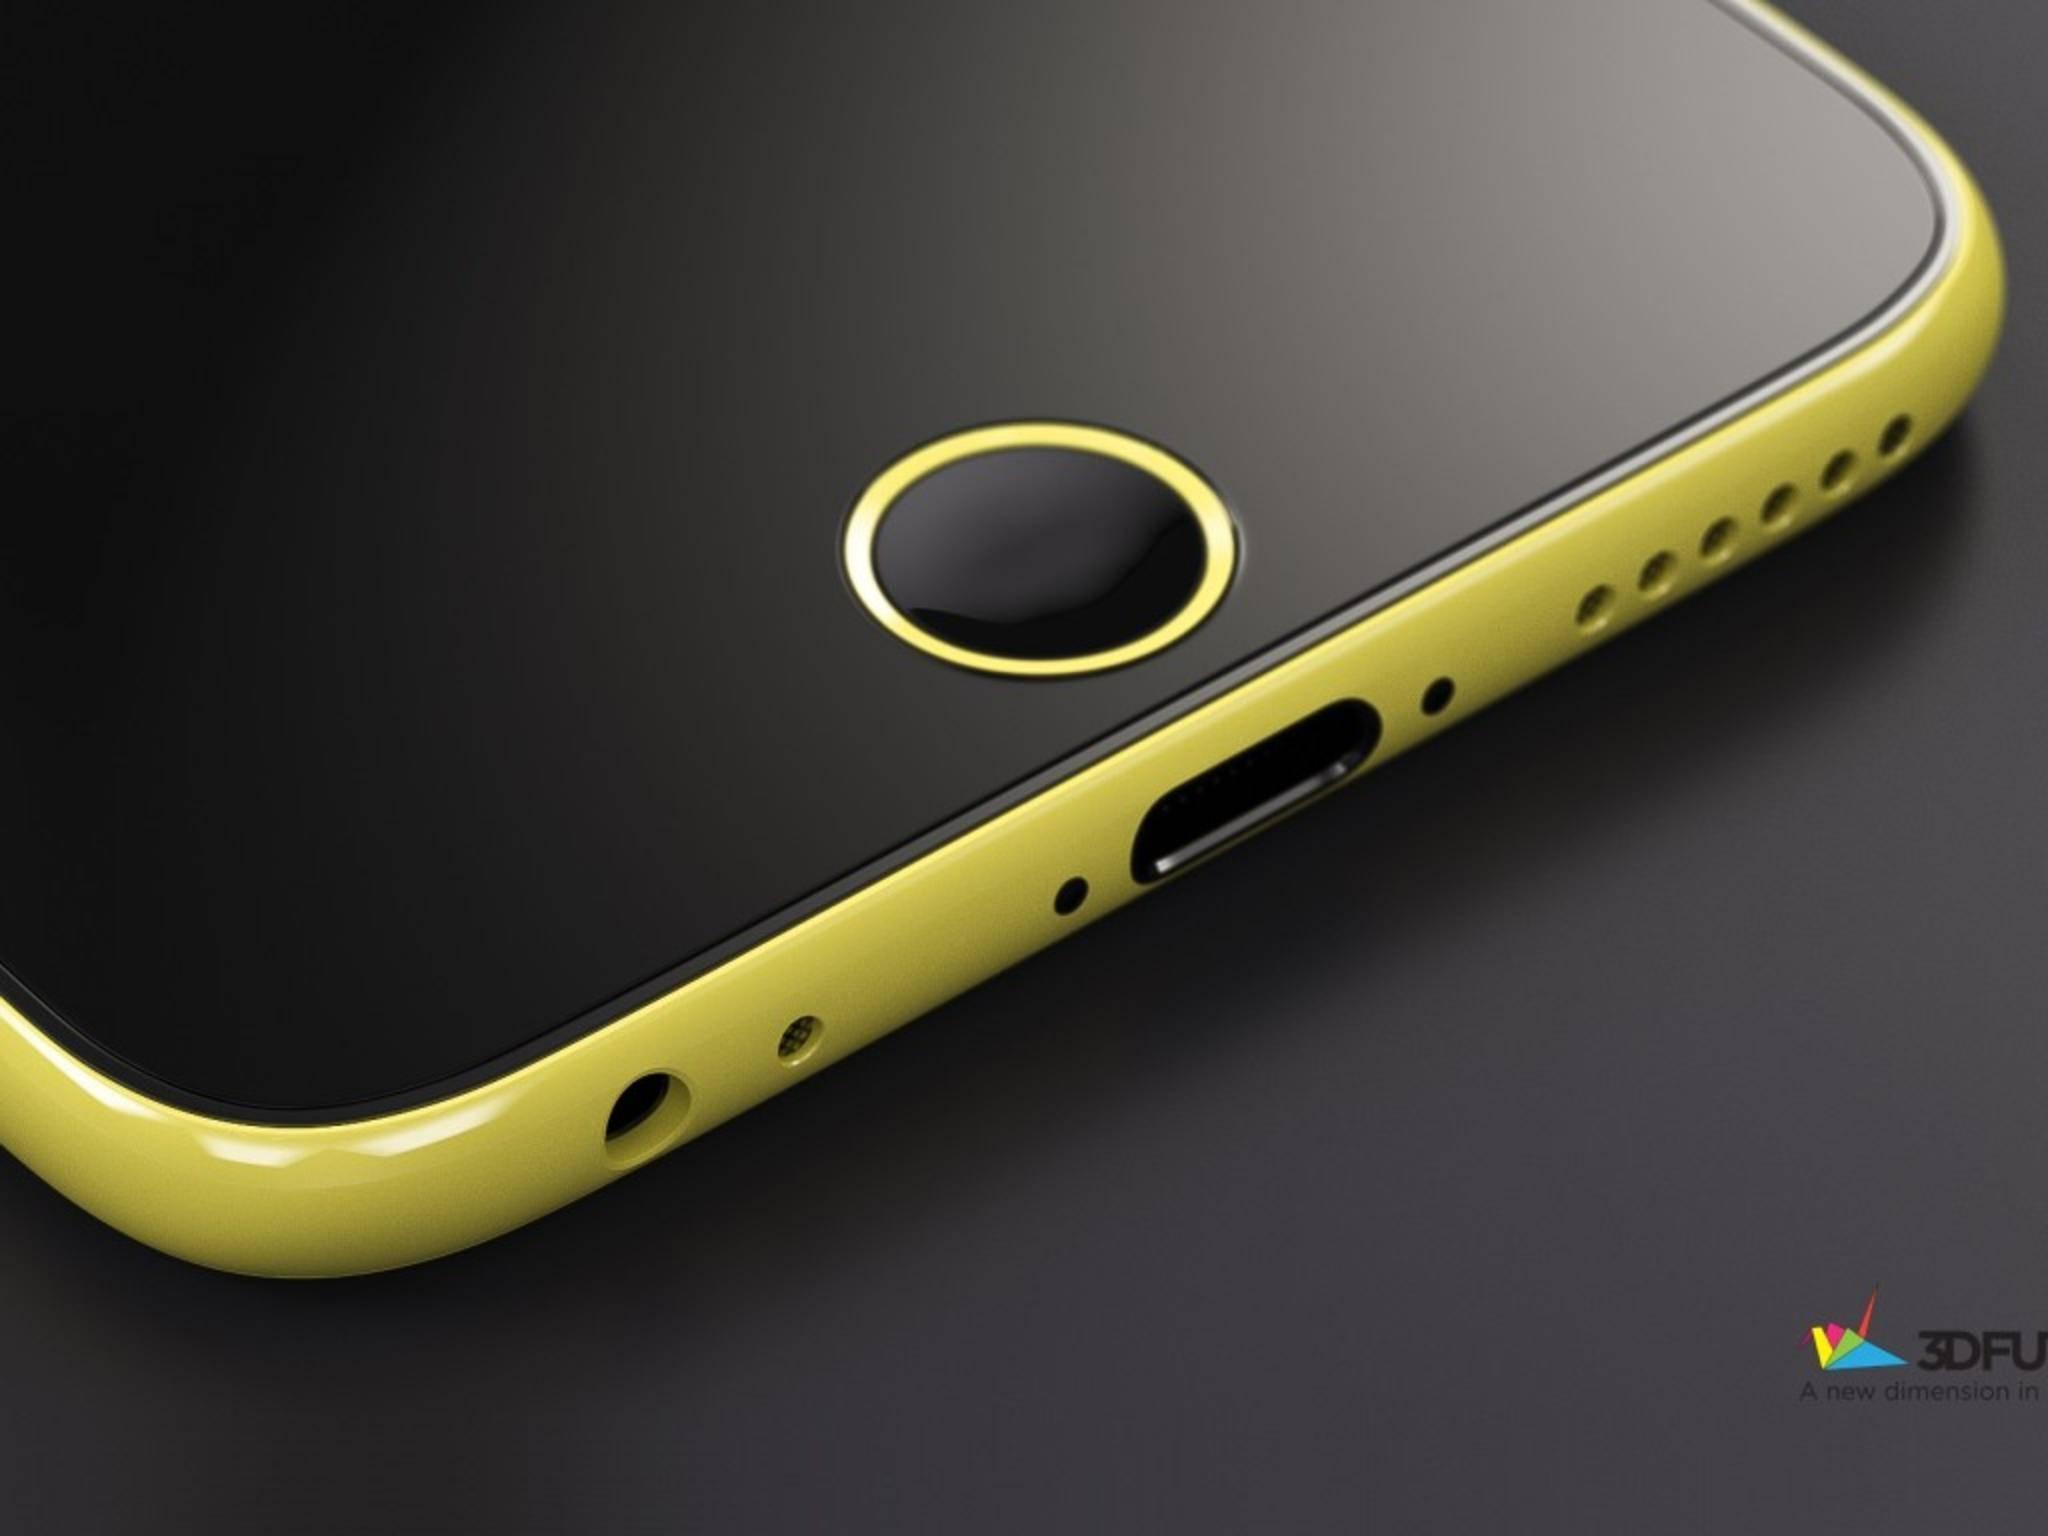 Ein iPhone 6c existiert bislang nur in Konzepten.